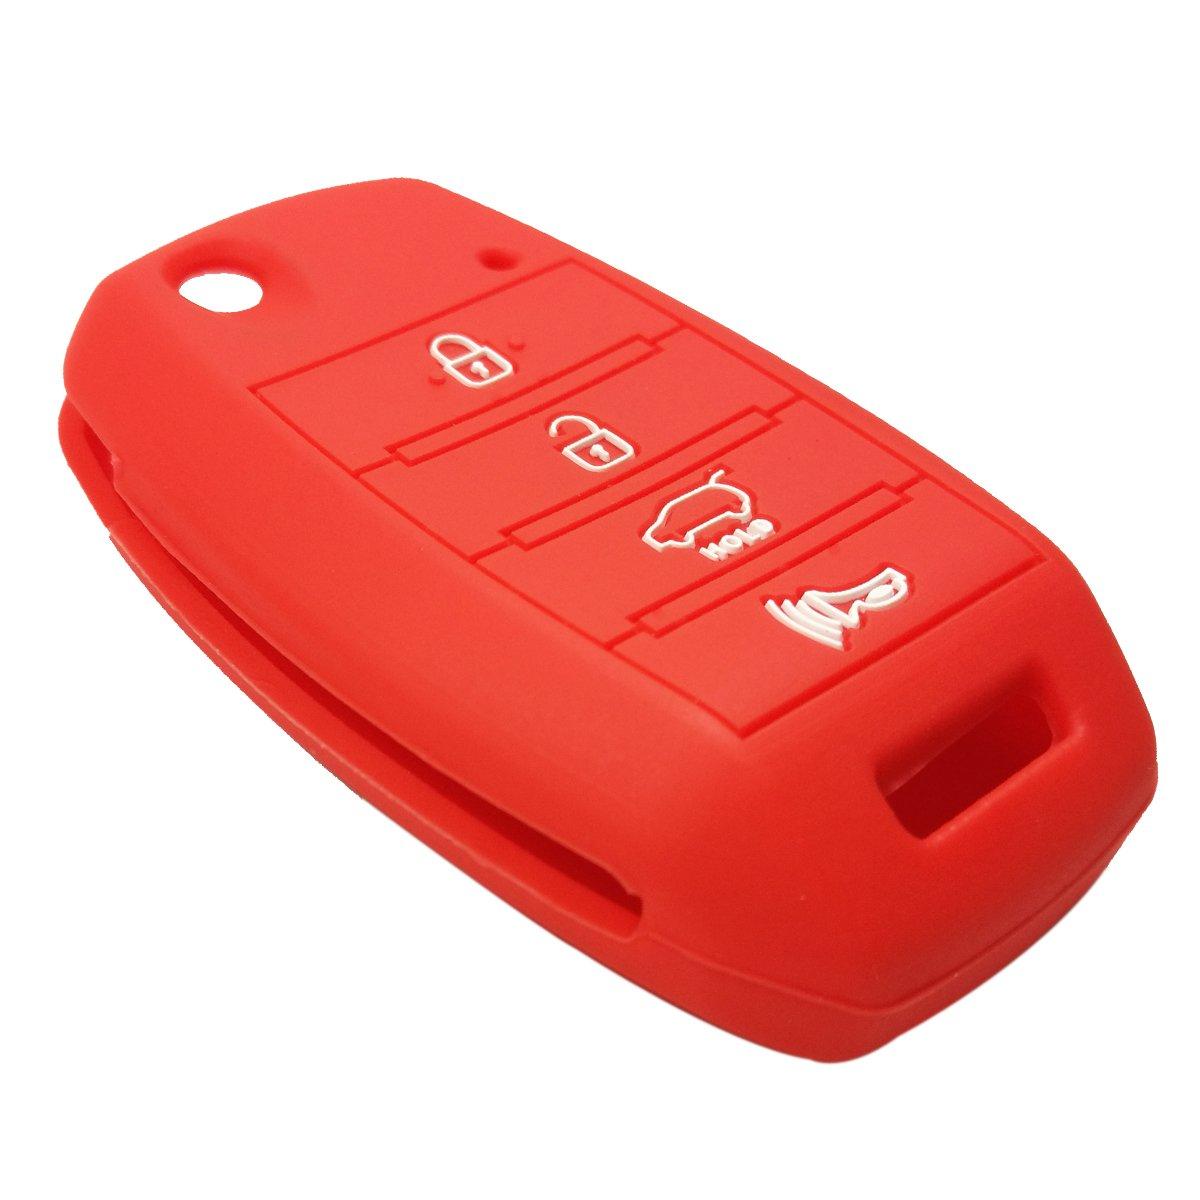 Coolbestda 2Pcs Silicone 4buttons Flip Folding Key Fob Remote Skin Cover Protector Keyless Entry Case for Kia Sorento Sportage Rio Soul Forte Optima Carens Black Blue (Not Fit Smart Key Fob)